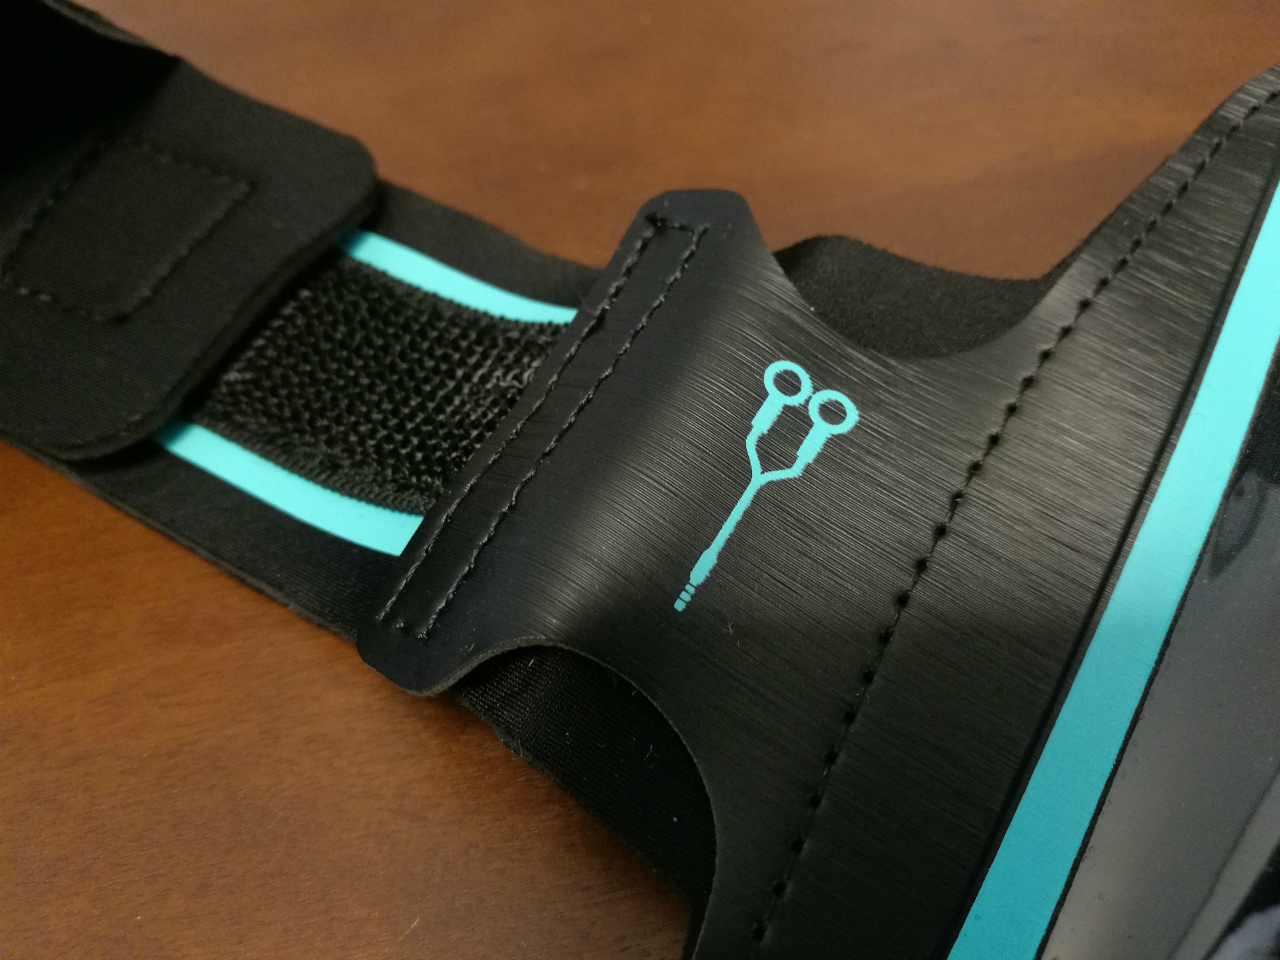 pr-anypro-sports-armband-05